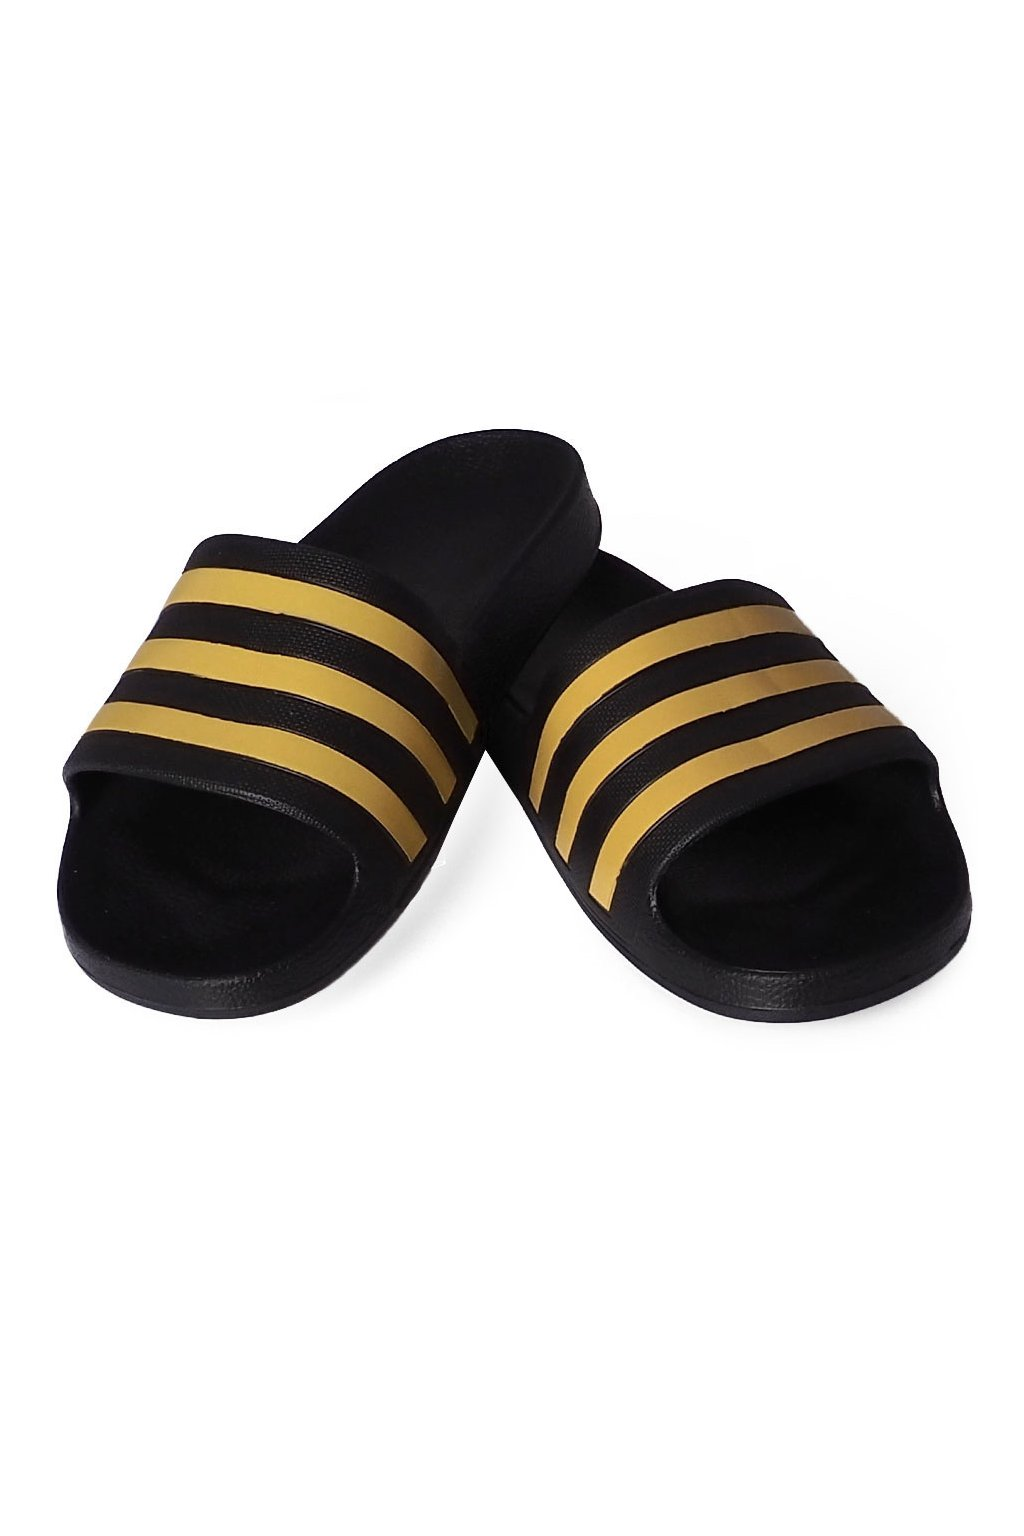 Šľapky unisex Adidas Adilette Aqua čierne EG1758